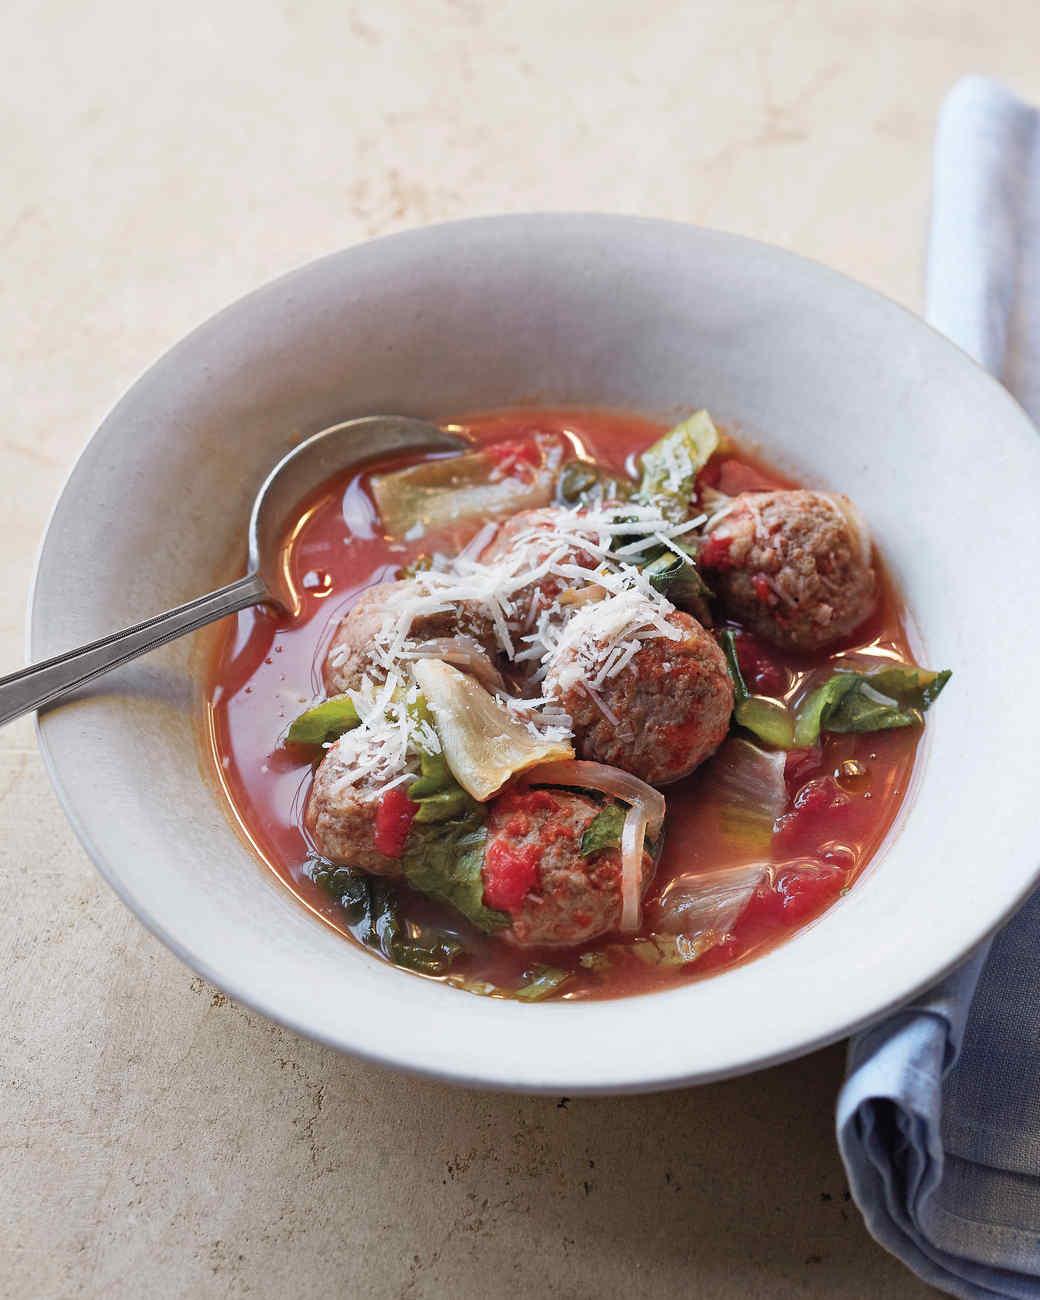 italian-wedding-soup-2-286-d112670.jpg